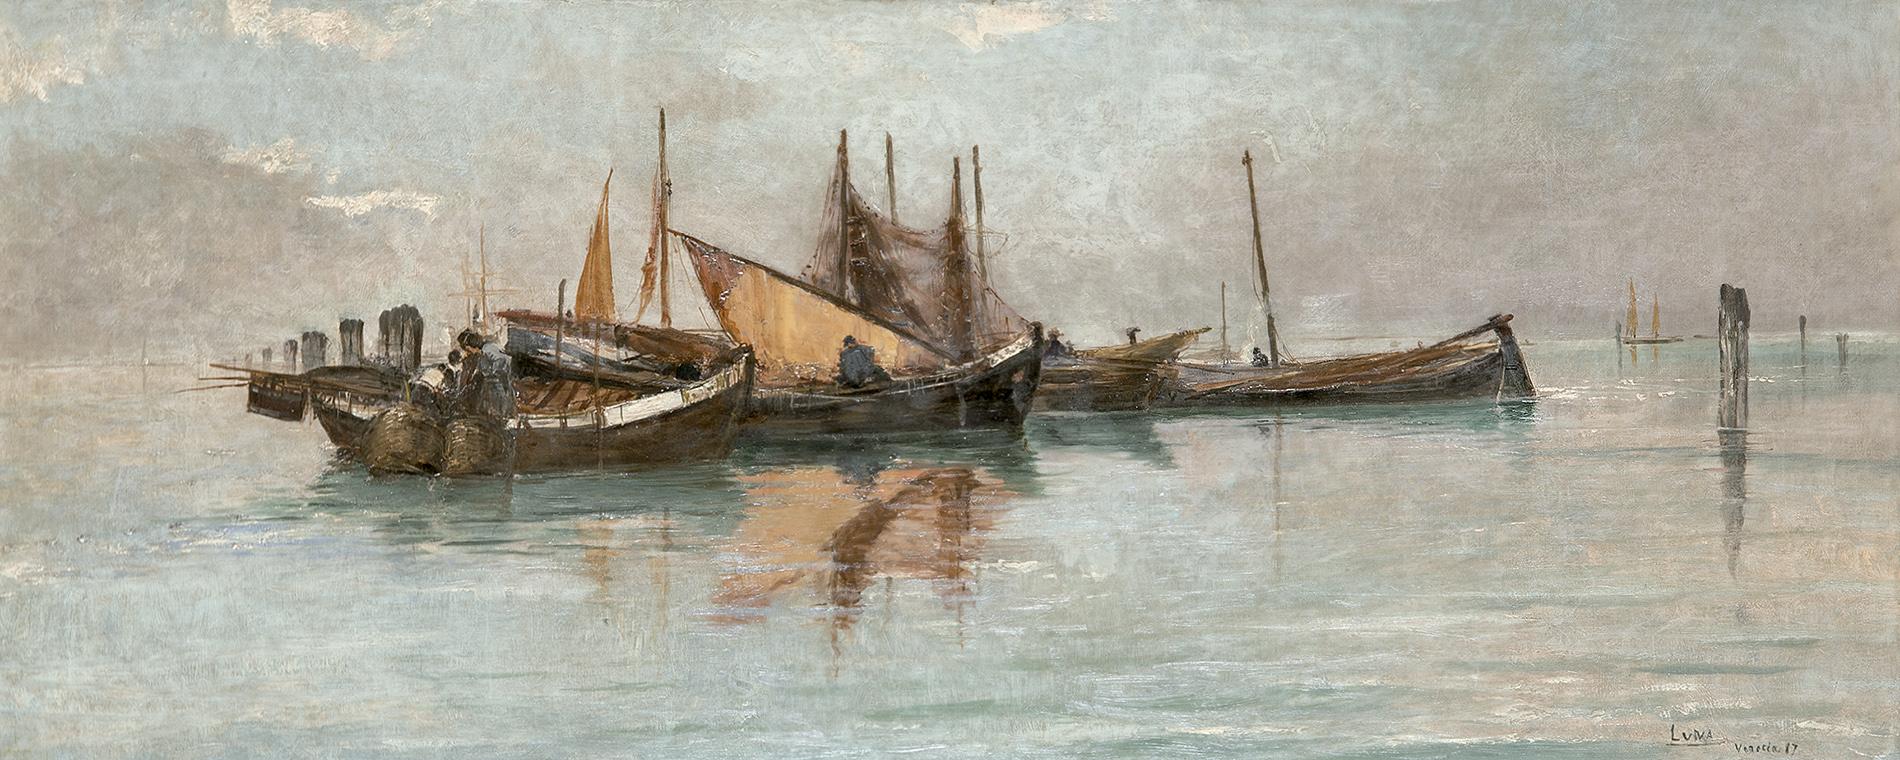 Juan Luna. Claro de luna en la laguna de Venecia, 1887. Salida: 48.000 euros. Remate: 65.000 euros